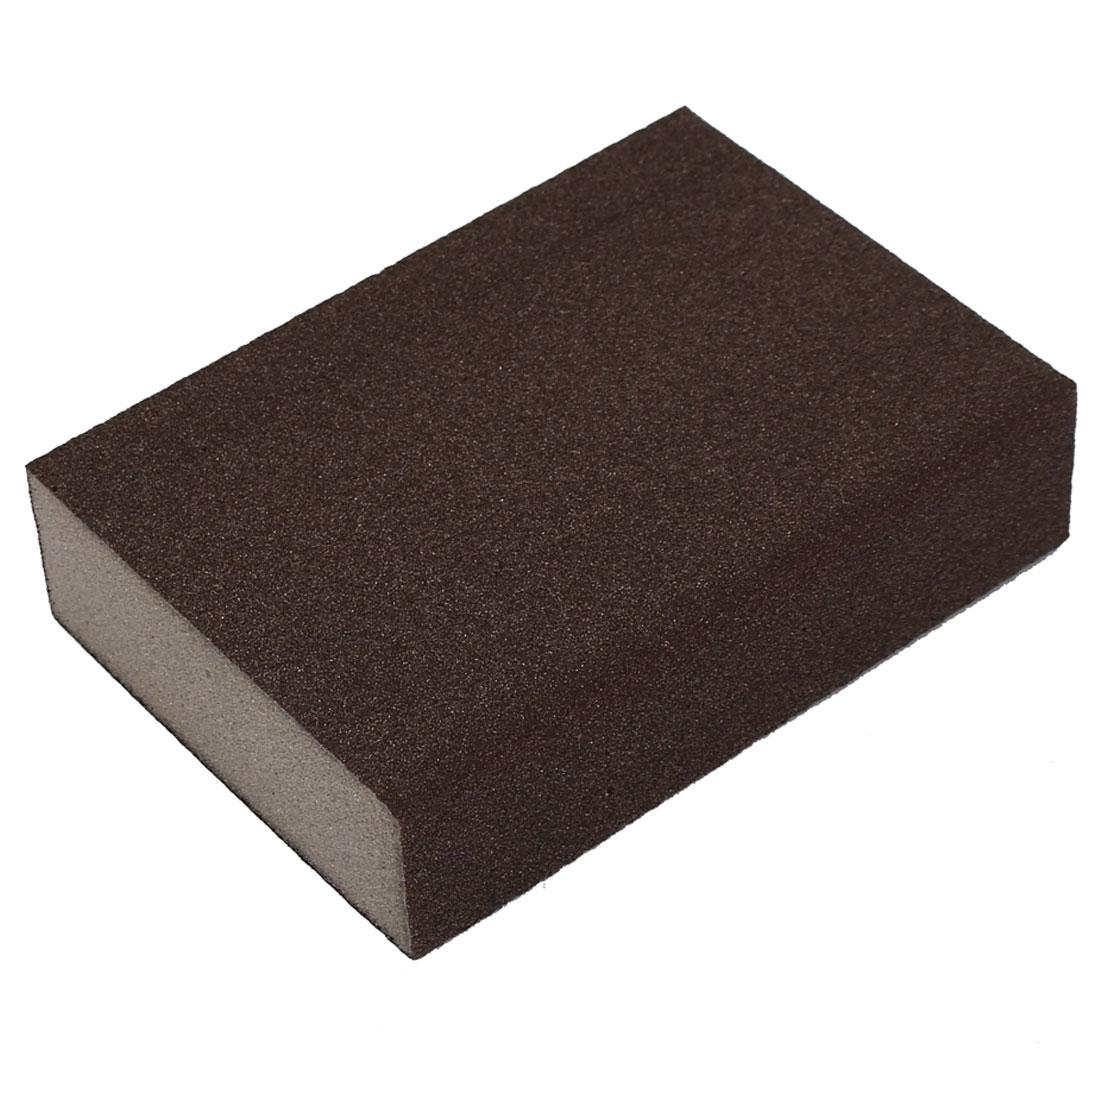 100mm x 70mm x 25mm 400 Grit Sponges Polishing Pad Sanding Block